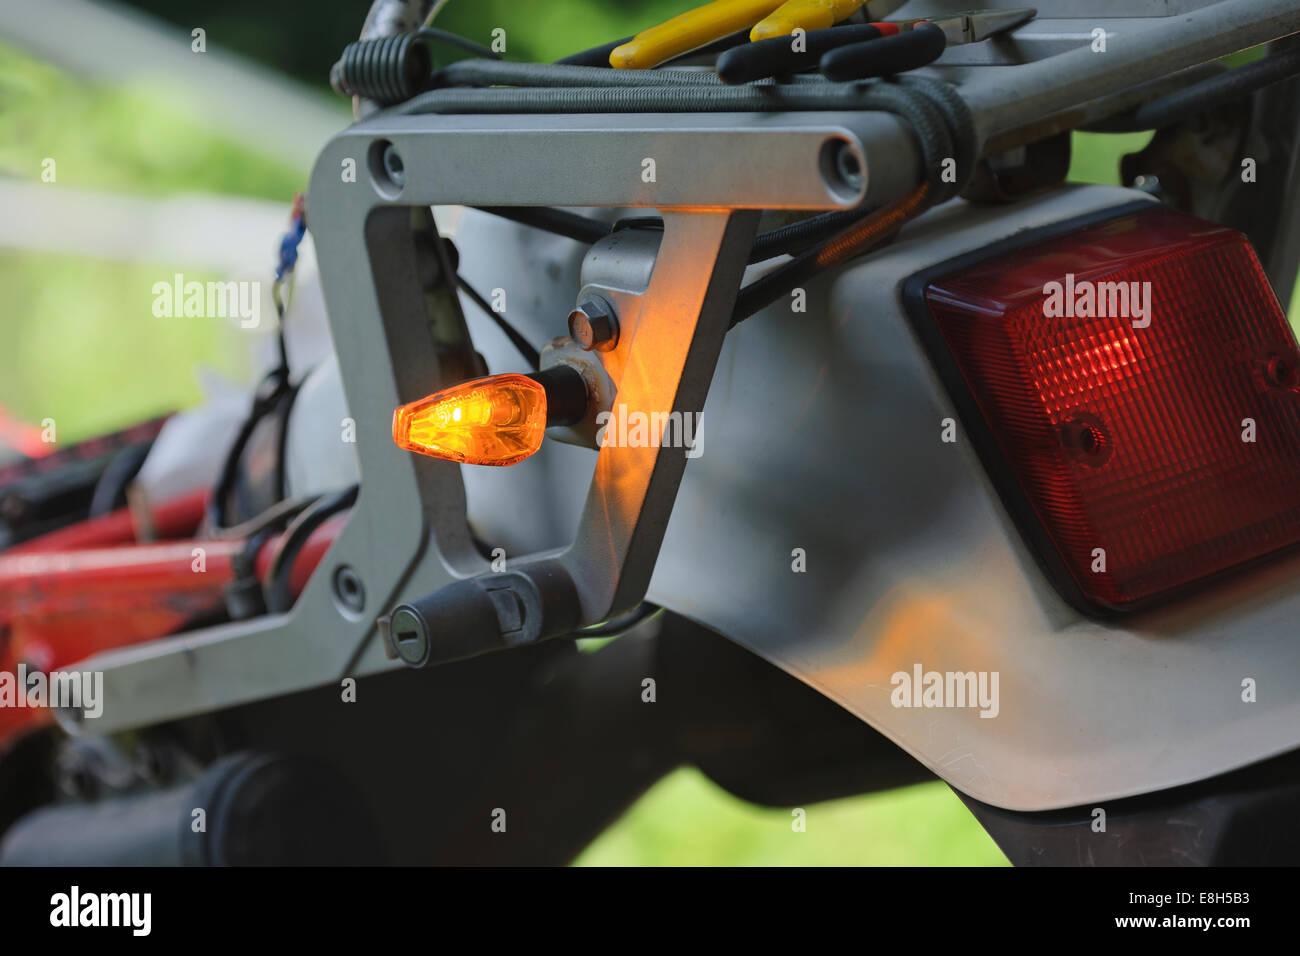 Indicator at an enduro motorcycle - Stock Image